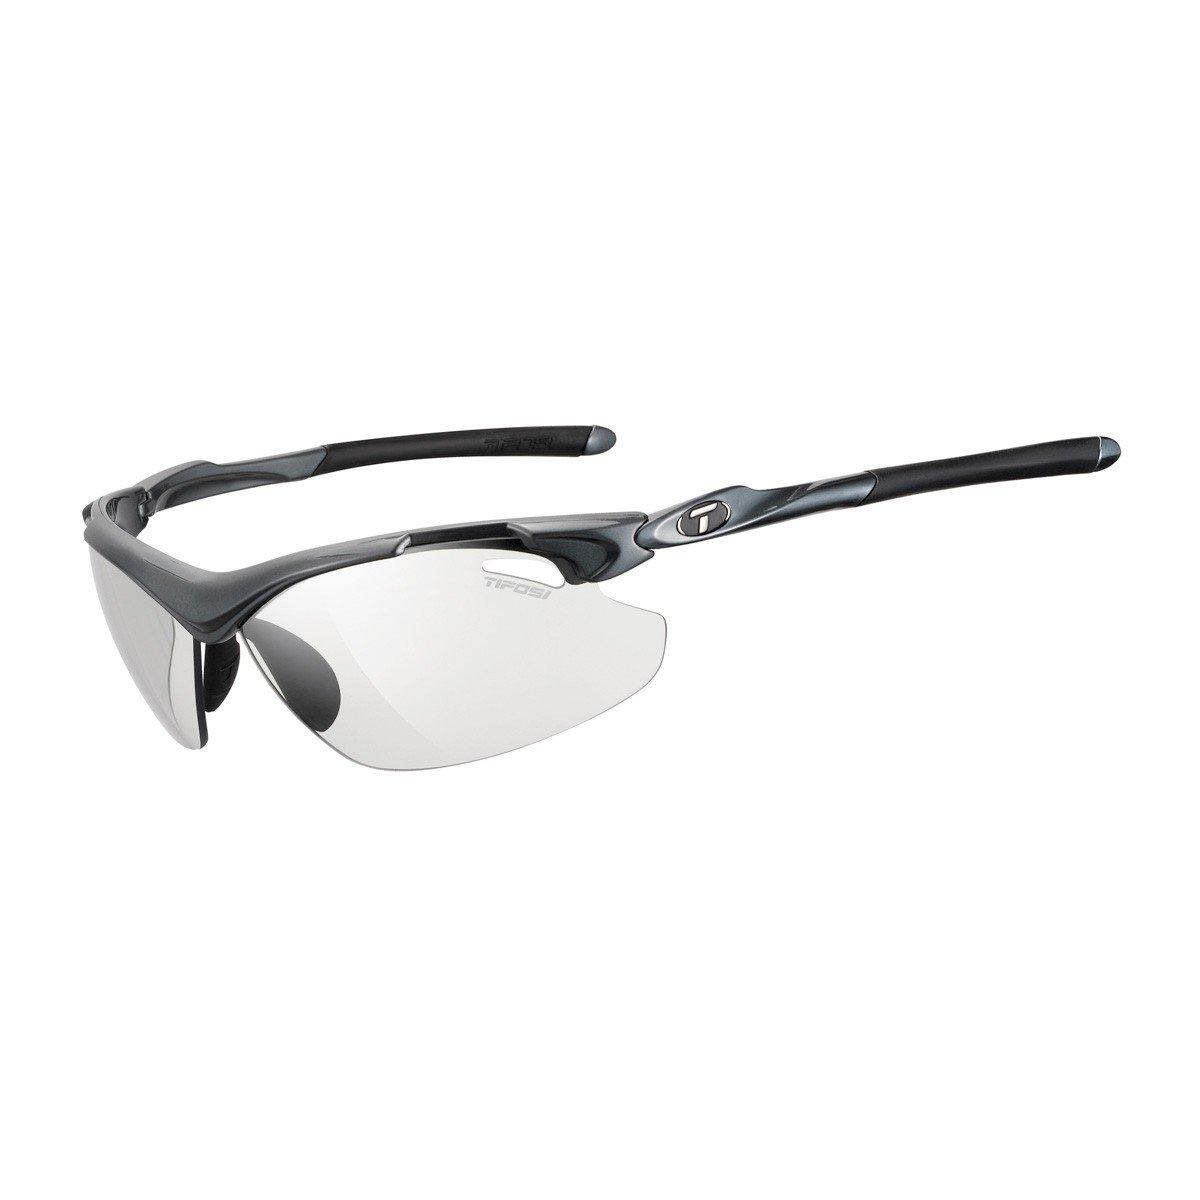 TALLA Talla única. Tifosi Tyrant 2.0–Gafas de Sol